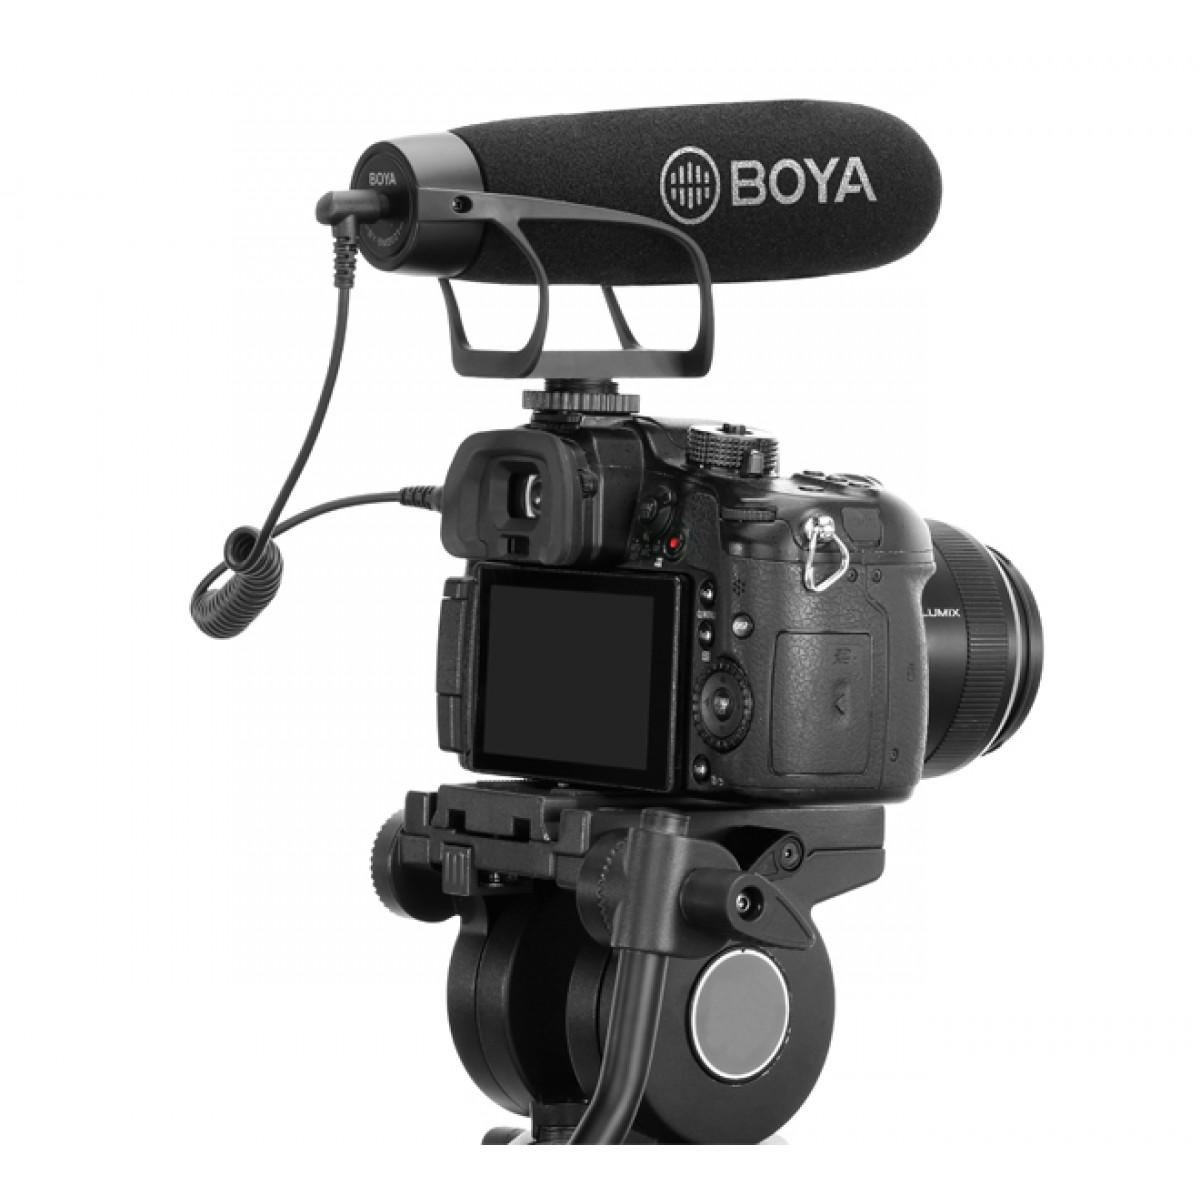 Microfone de Vídeo BOYA BY-BM2021, TRS/TRRS, Black